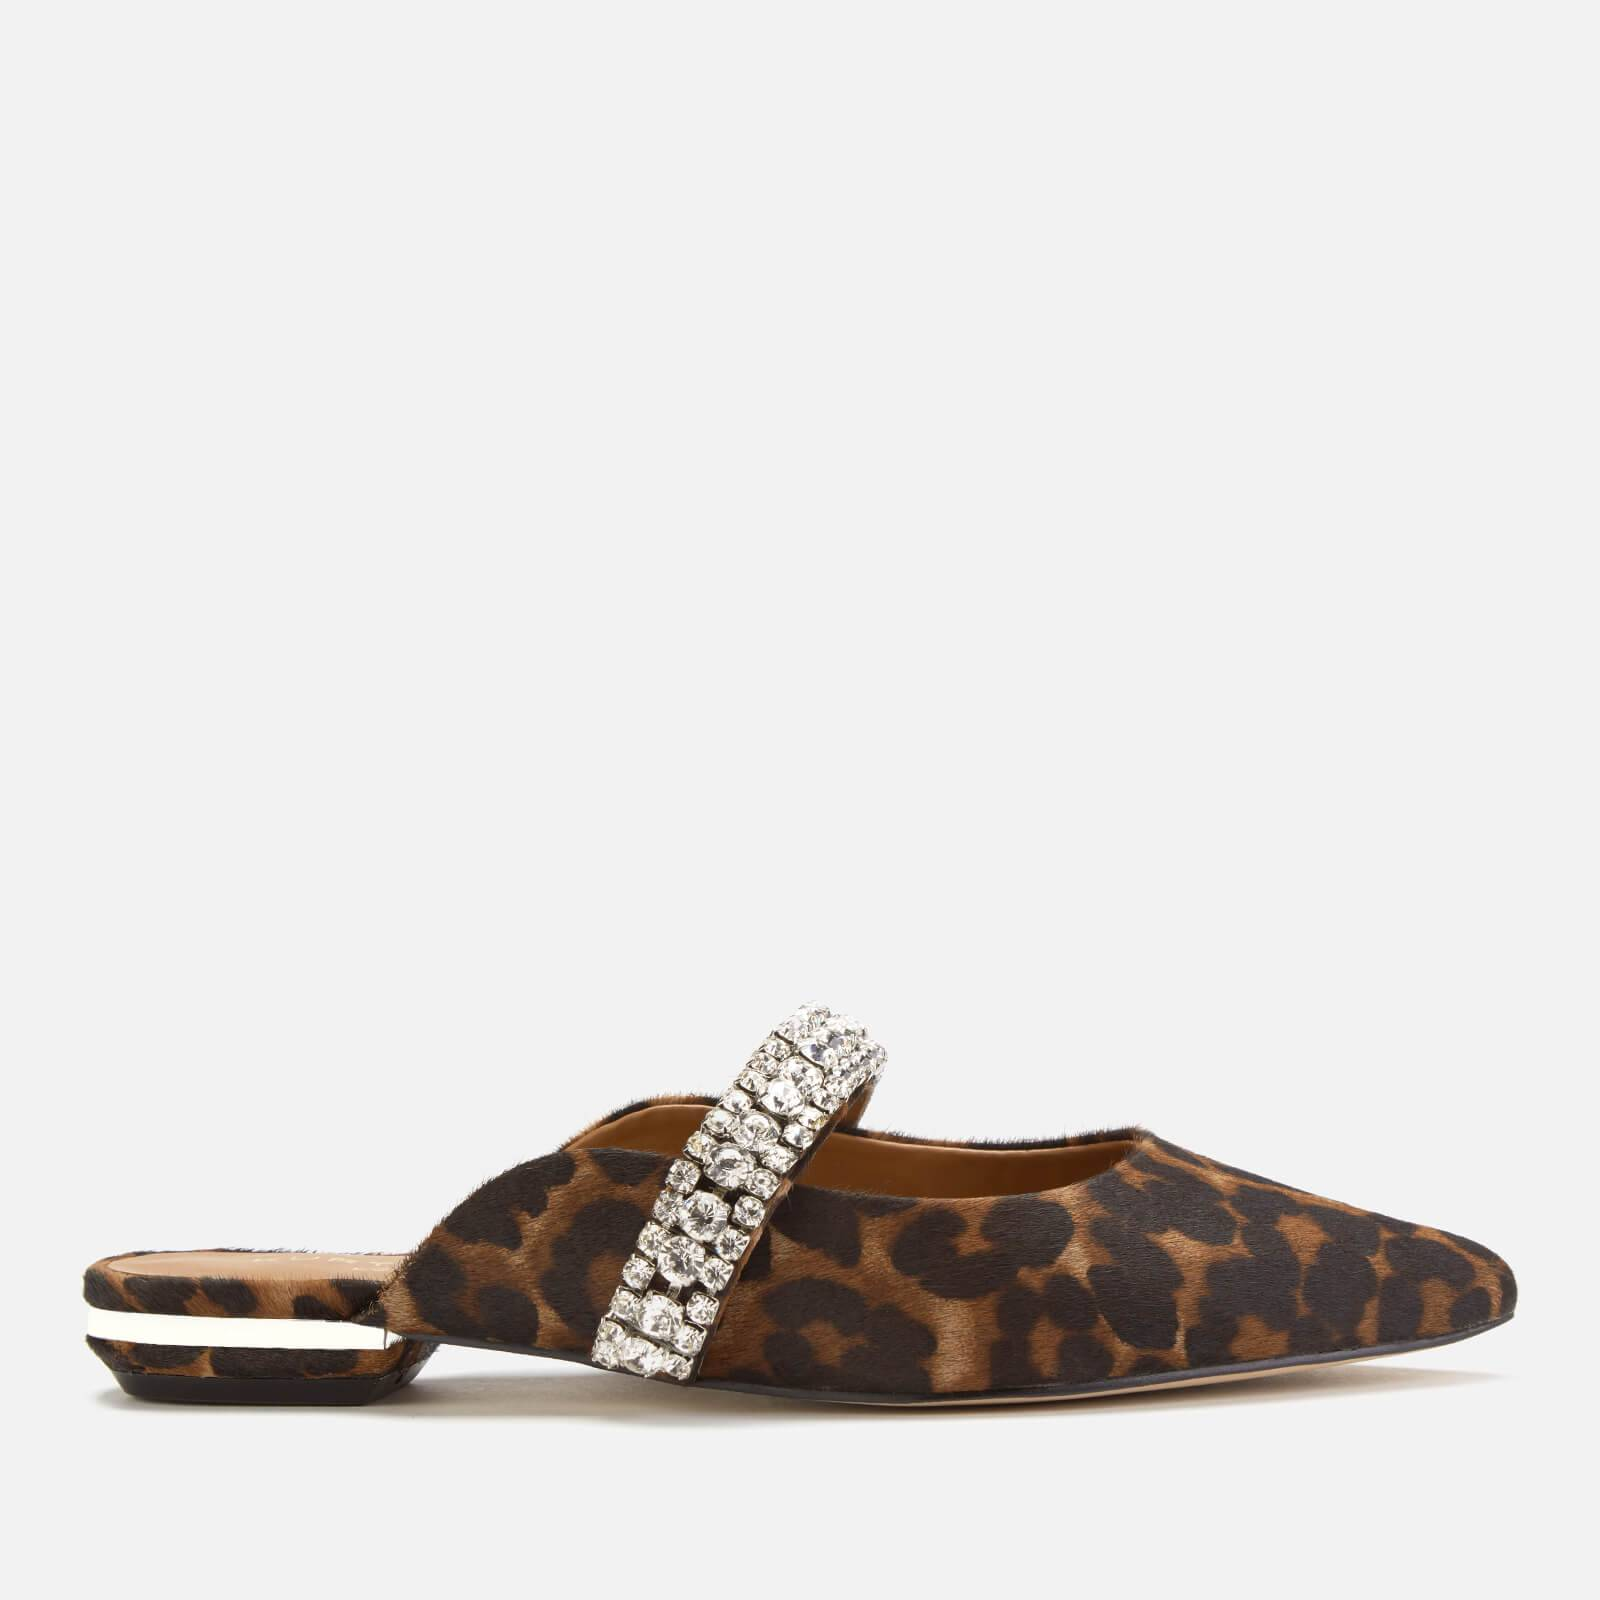 Kurt Geiger London Women's Princely Flat Mules - Cream Comb - UK 4 - Tan